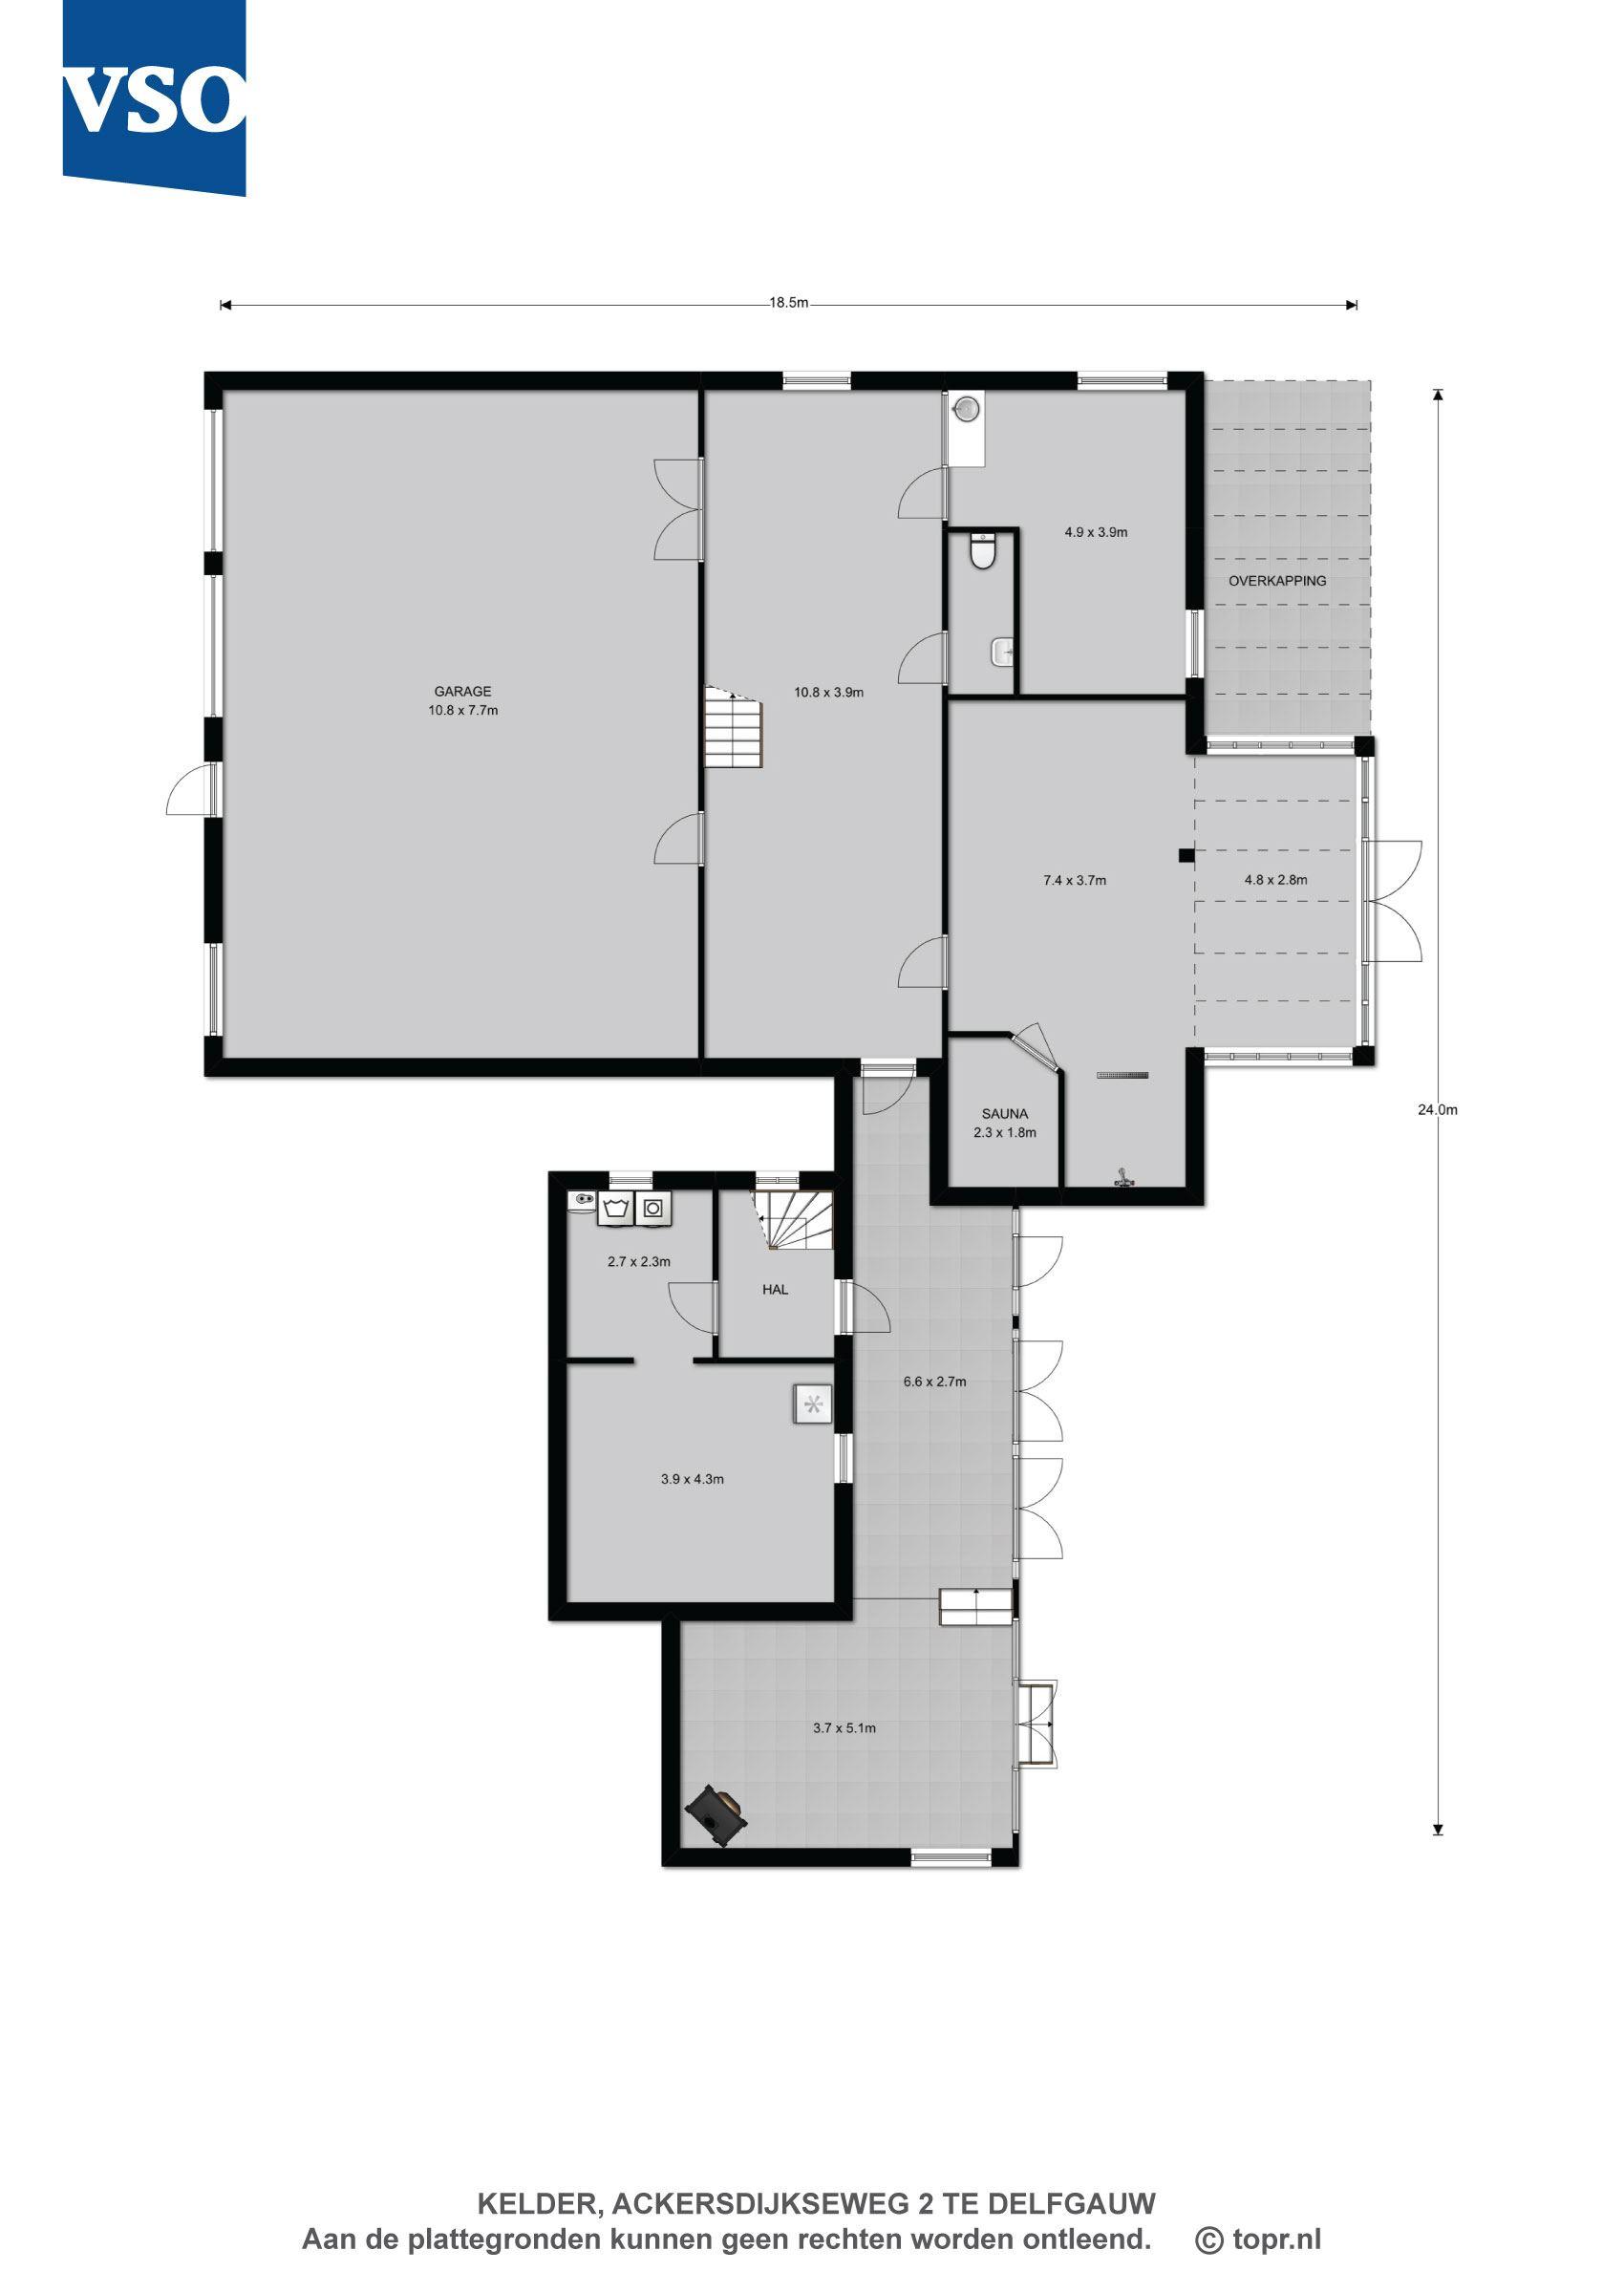 Huis te koop: Ackersdijkseweg 2 2645 BK Delfgauw [funda]